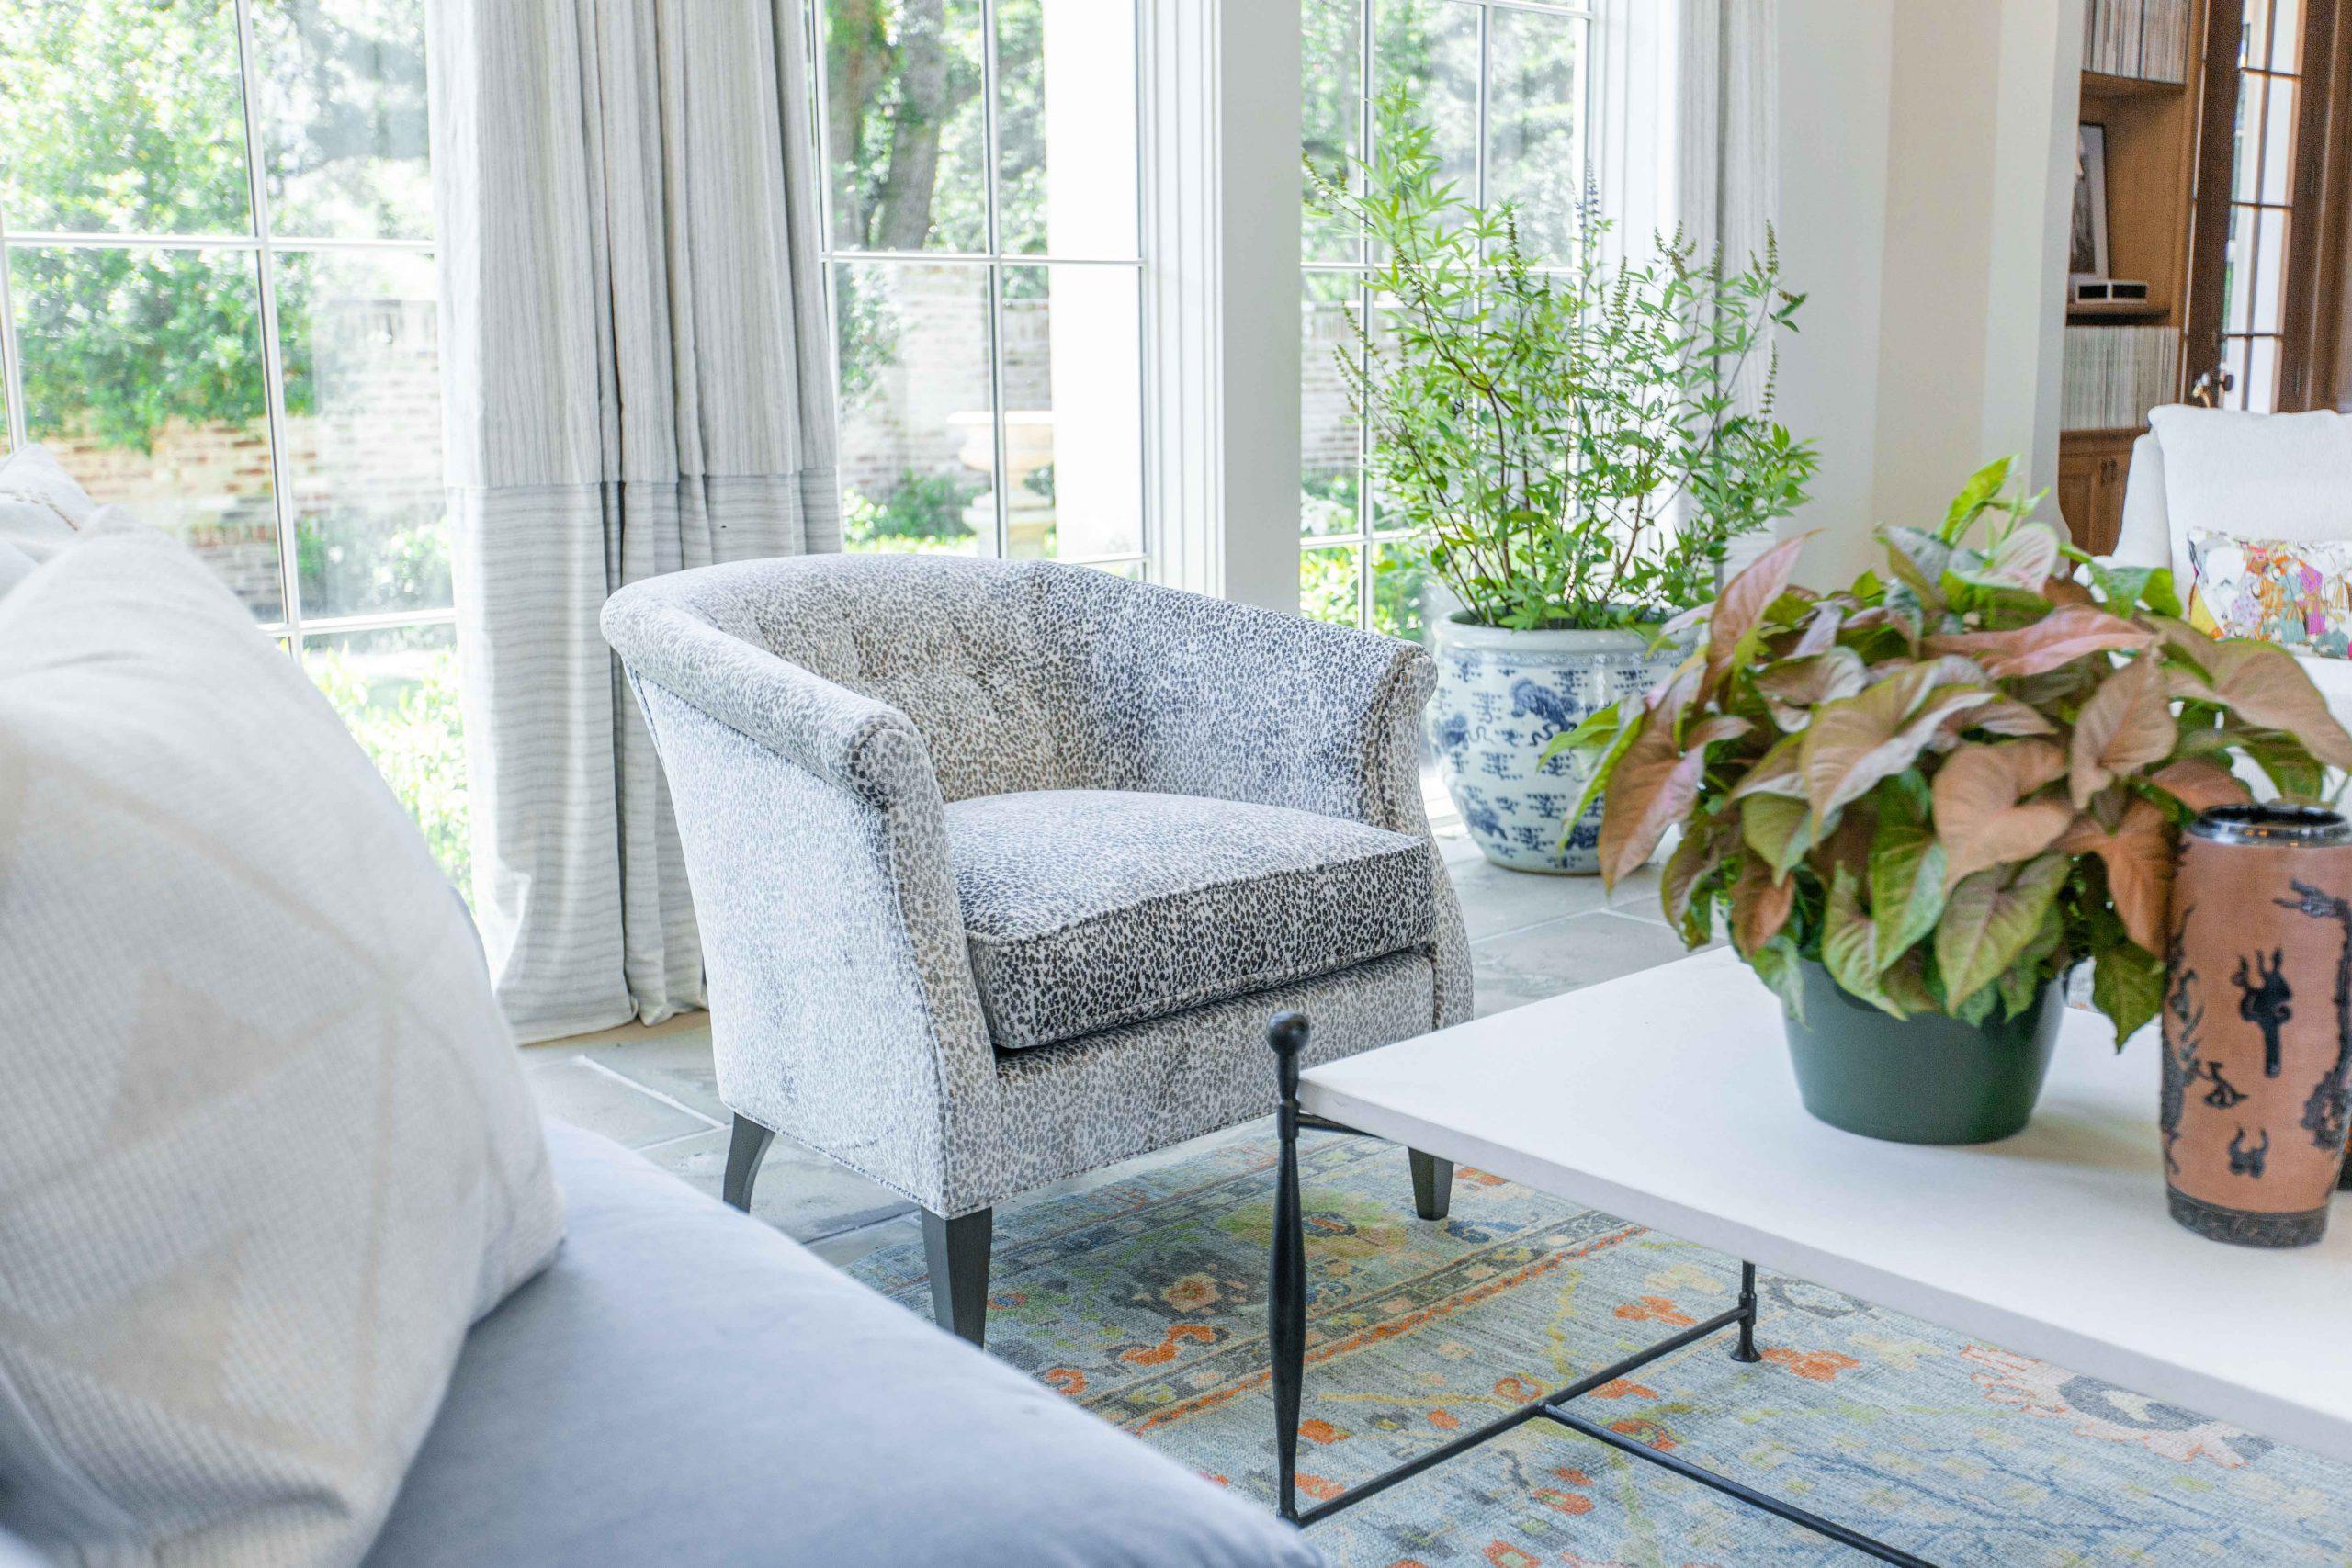 dixon-smith-interiors-baton-rouge-interior-design-custom-ivy-house-show-home-Web-0012